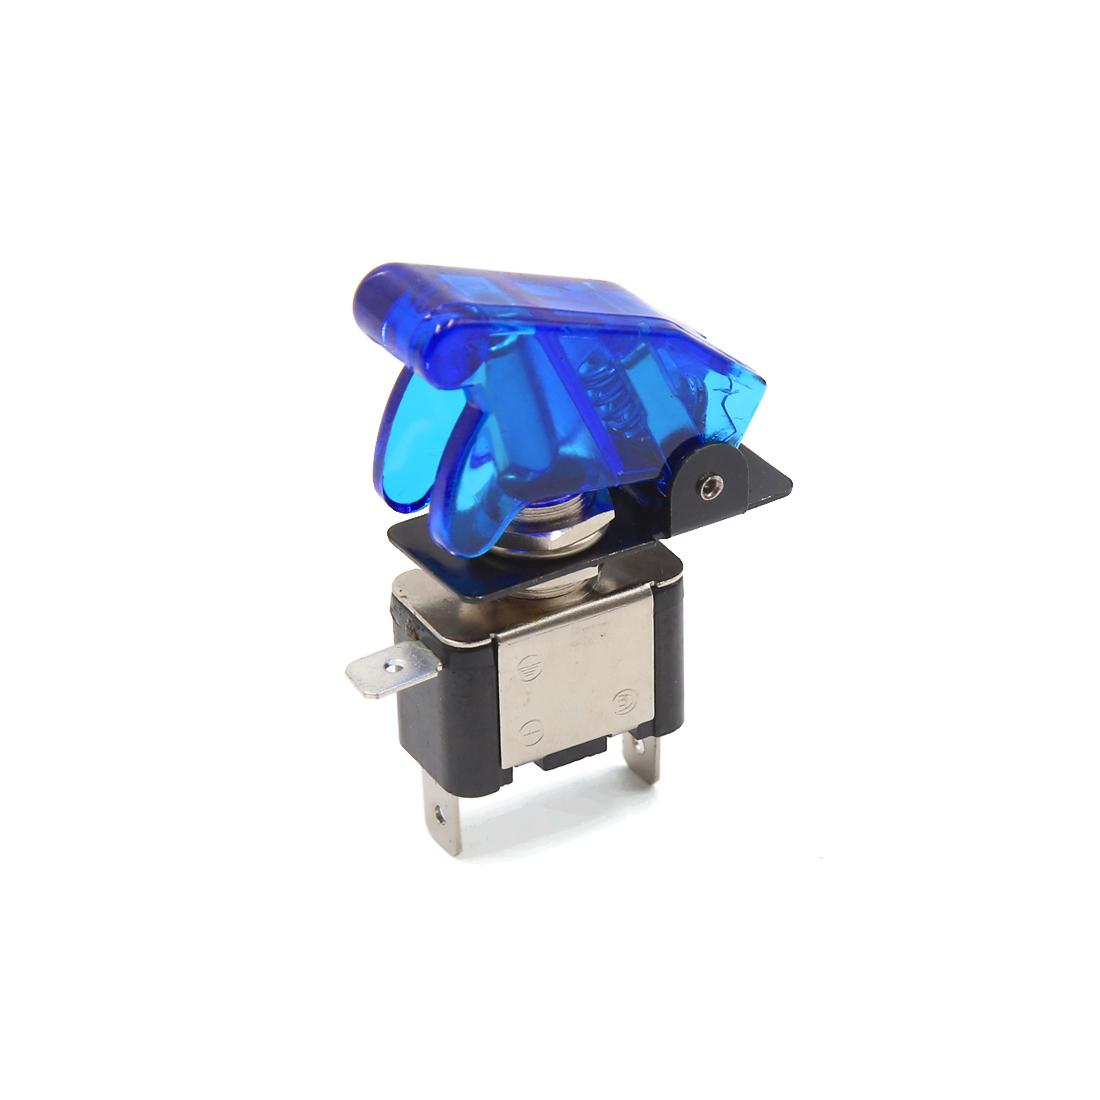 DC 12V 20A Blue LED Light SPST ON/OFF 3 Pin Rocker Toggle Switch for Auto Car Vehicle